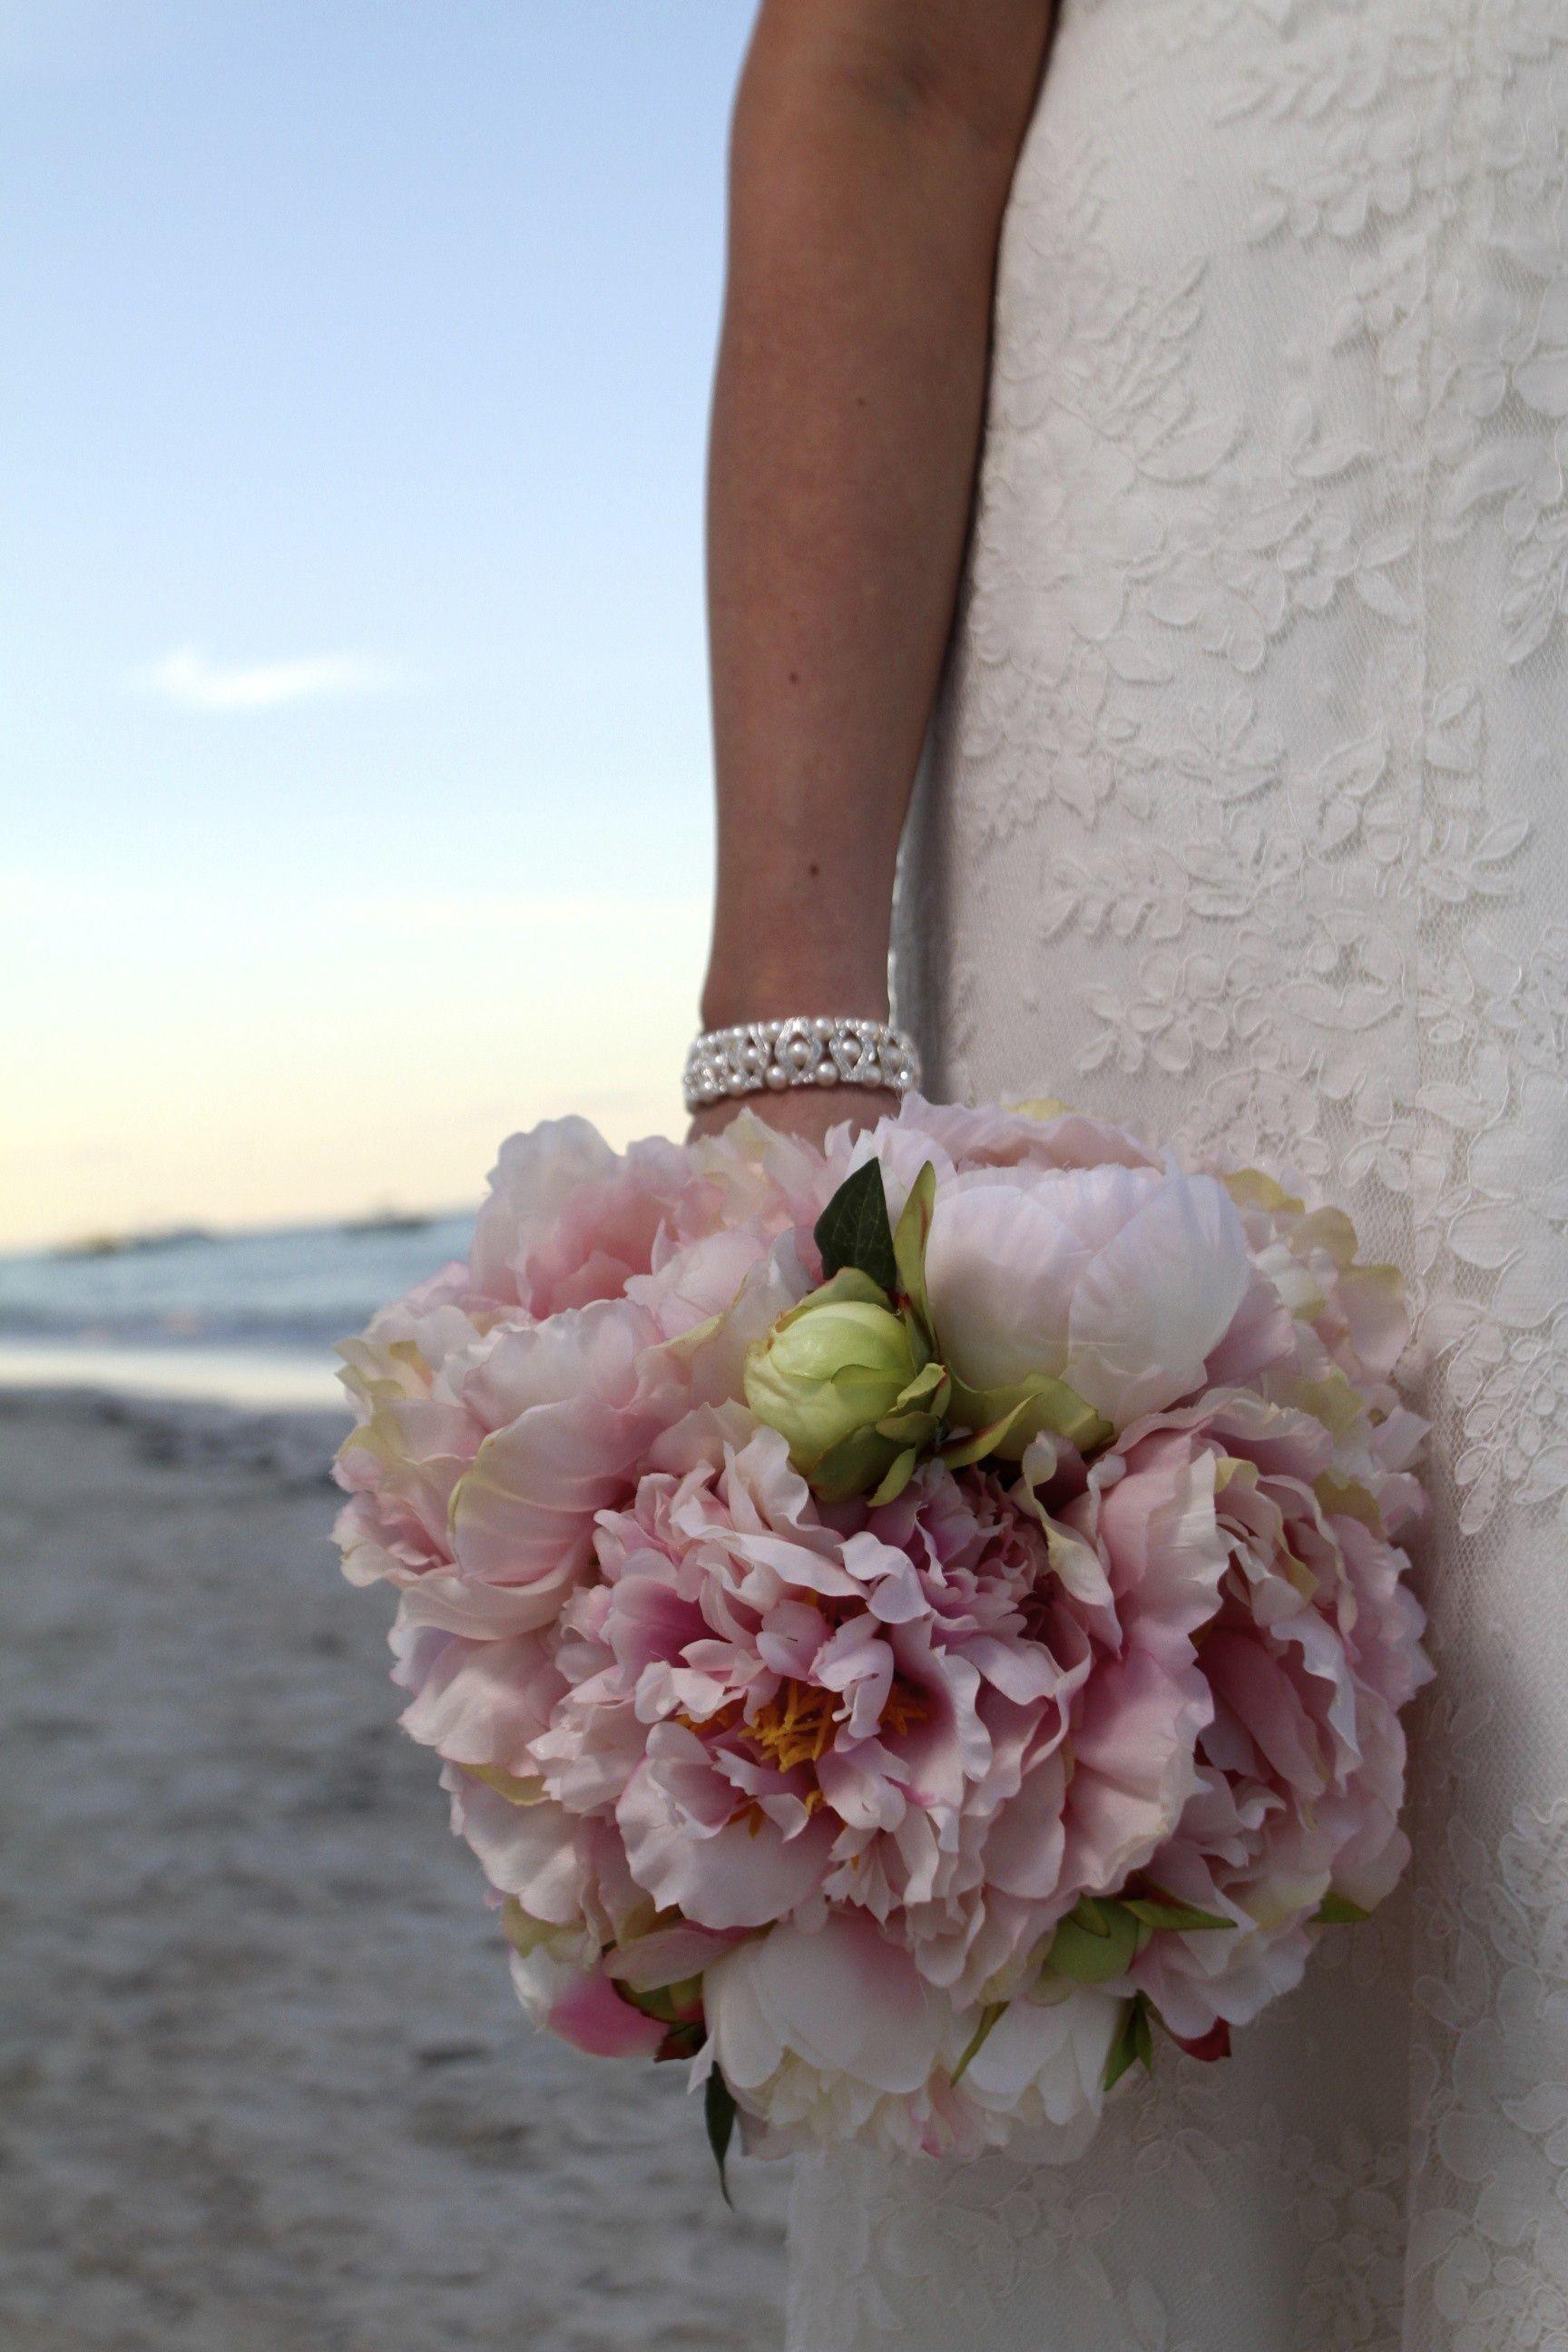 DIY Fabric flower bouquet | Weddingbee Do It Yourself: she shows a ...